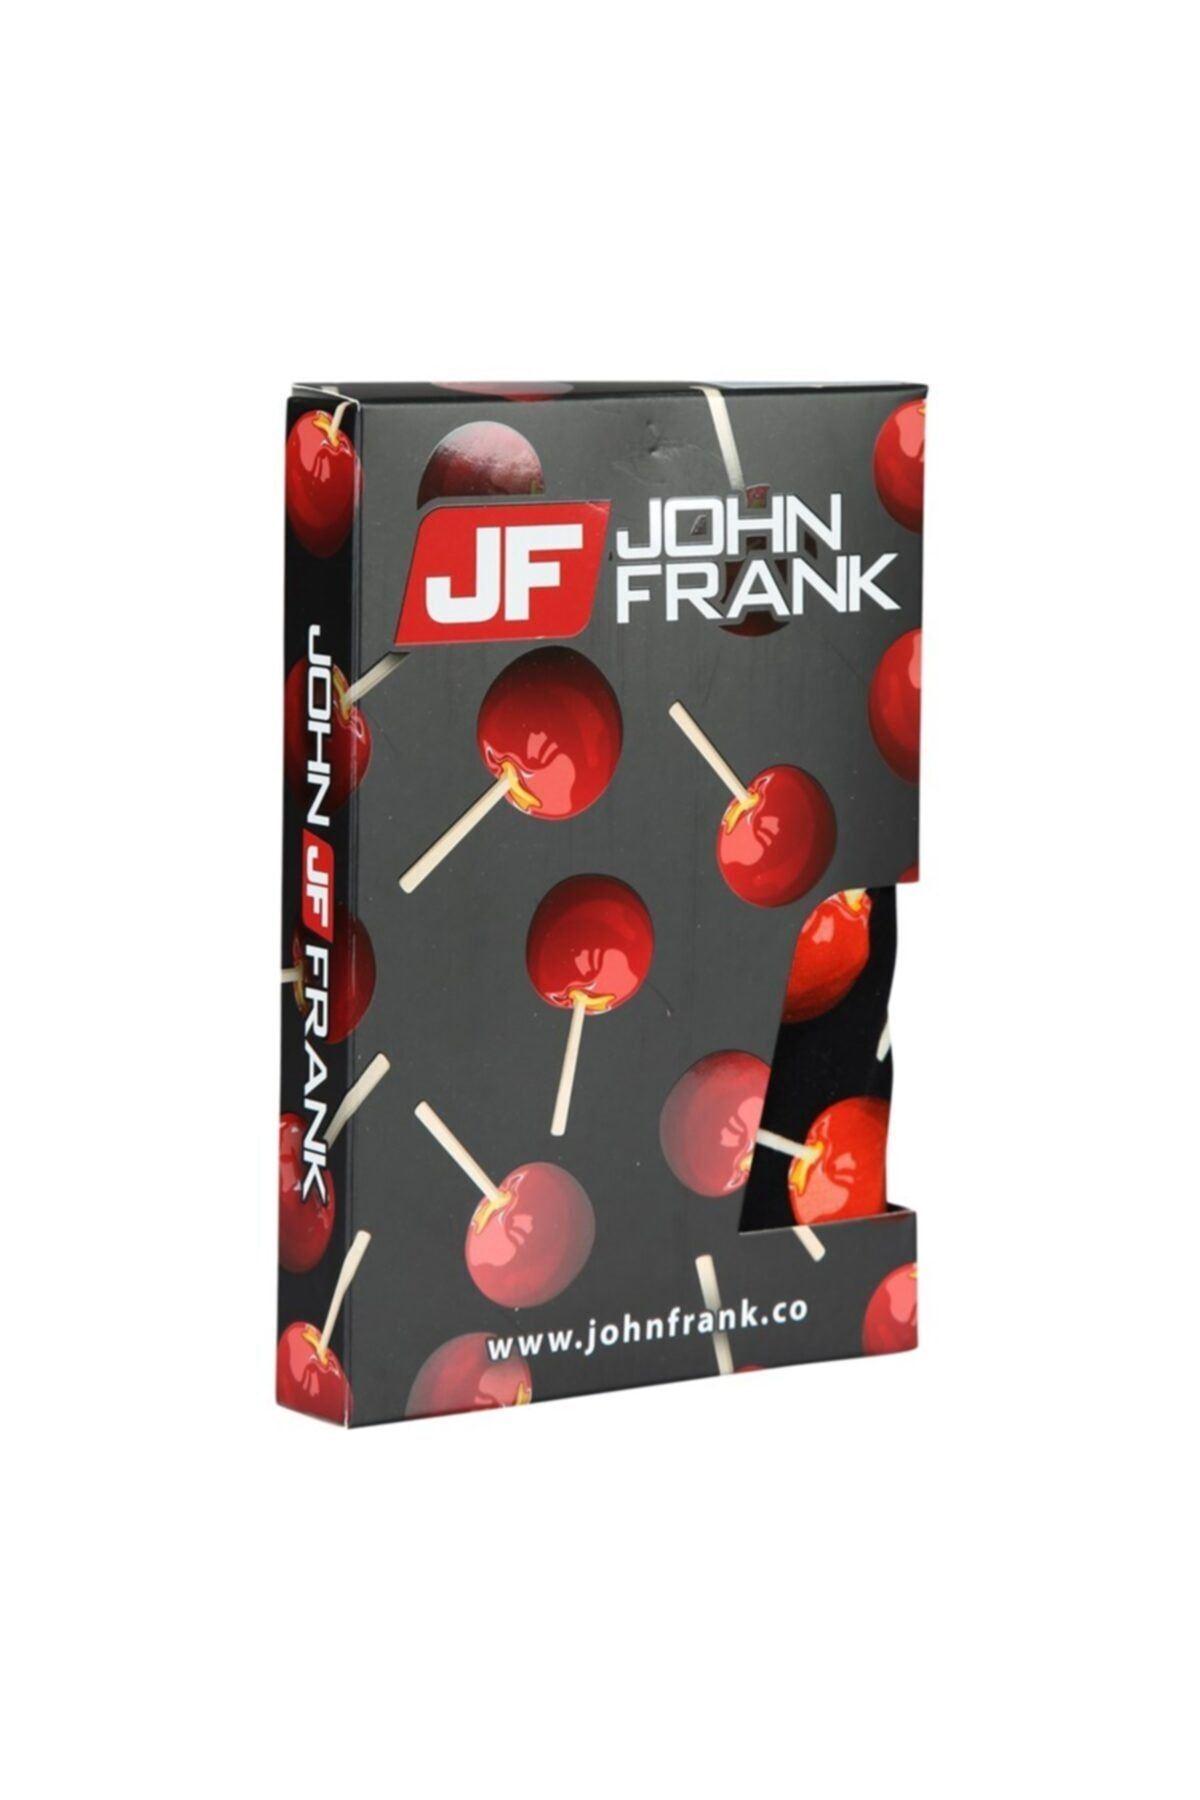 JOHN FRANK JFBD296-APPLE CANDY ERKEK BOXER DESENLİ